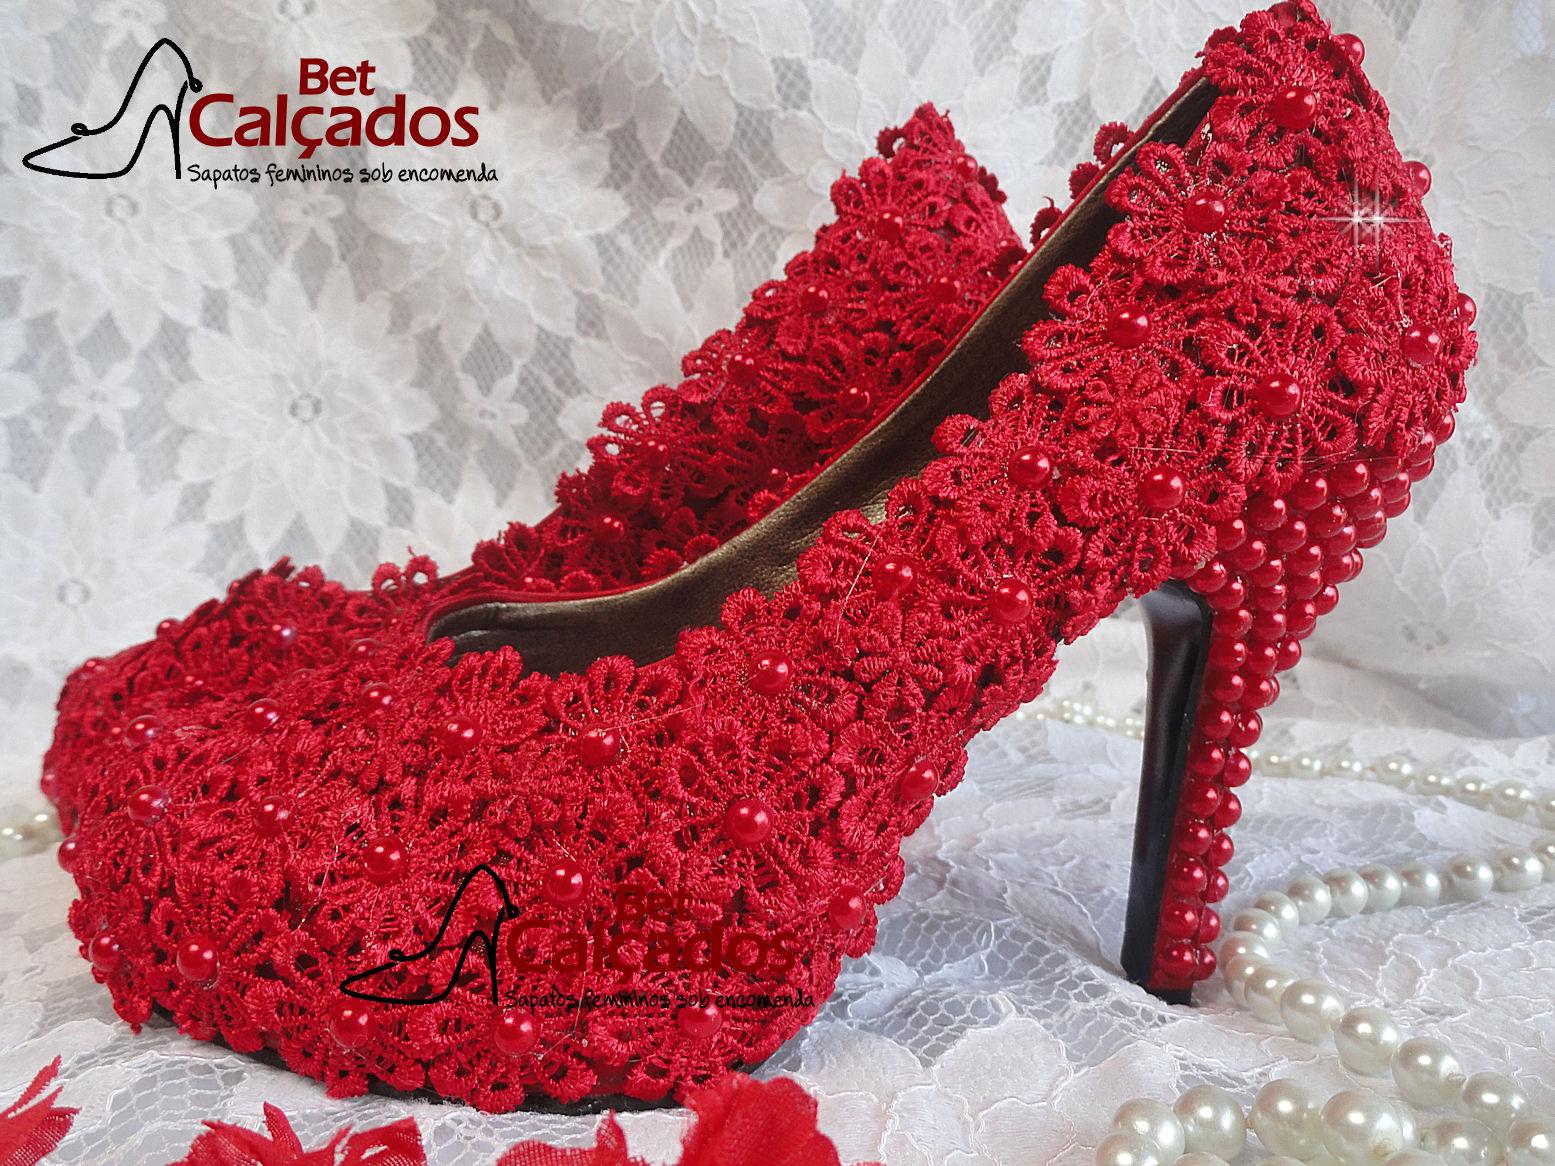 8f22e38d65 Sapato Noiva Sapato Customizado Sapato Debutante Sapato Azul Tiffany Sapato  Pérolas Sapato Cristais Sapato Noiva Colorido Sapato Festa Sapato Amarelo  Sapato ...